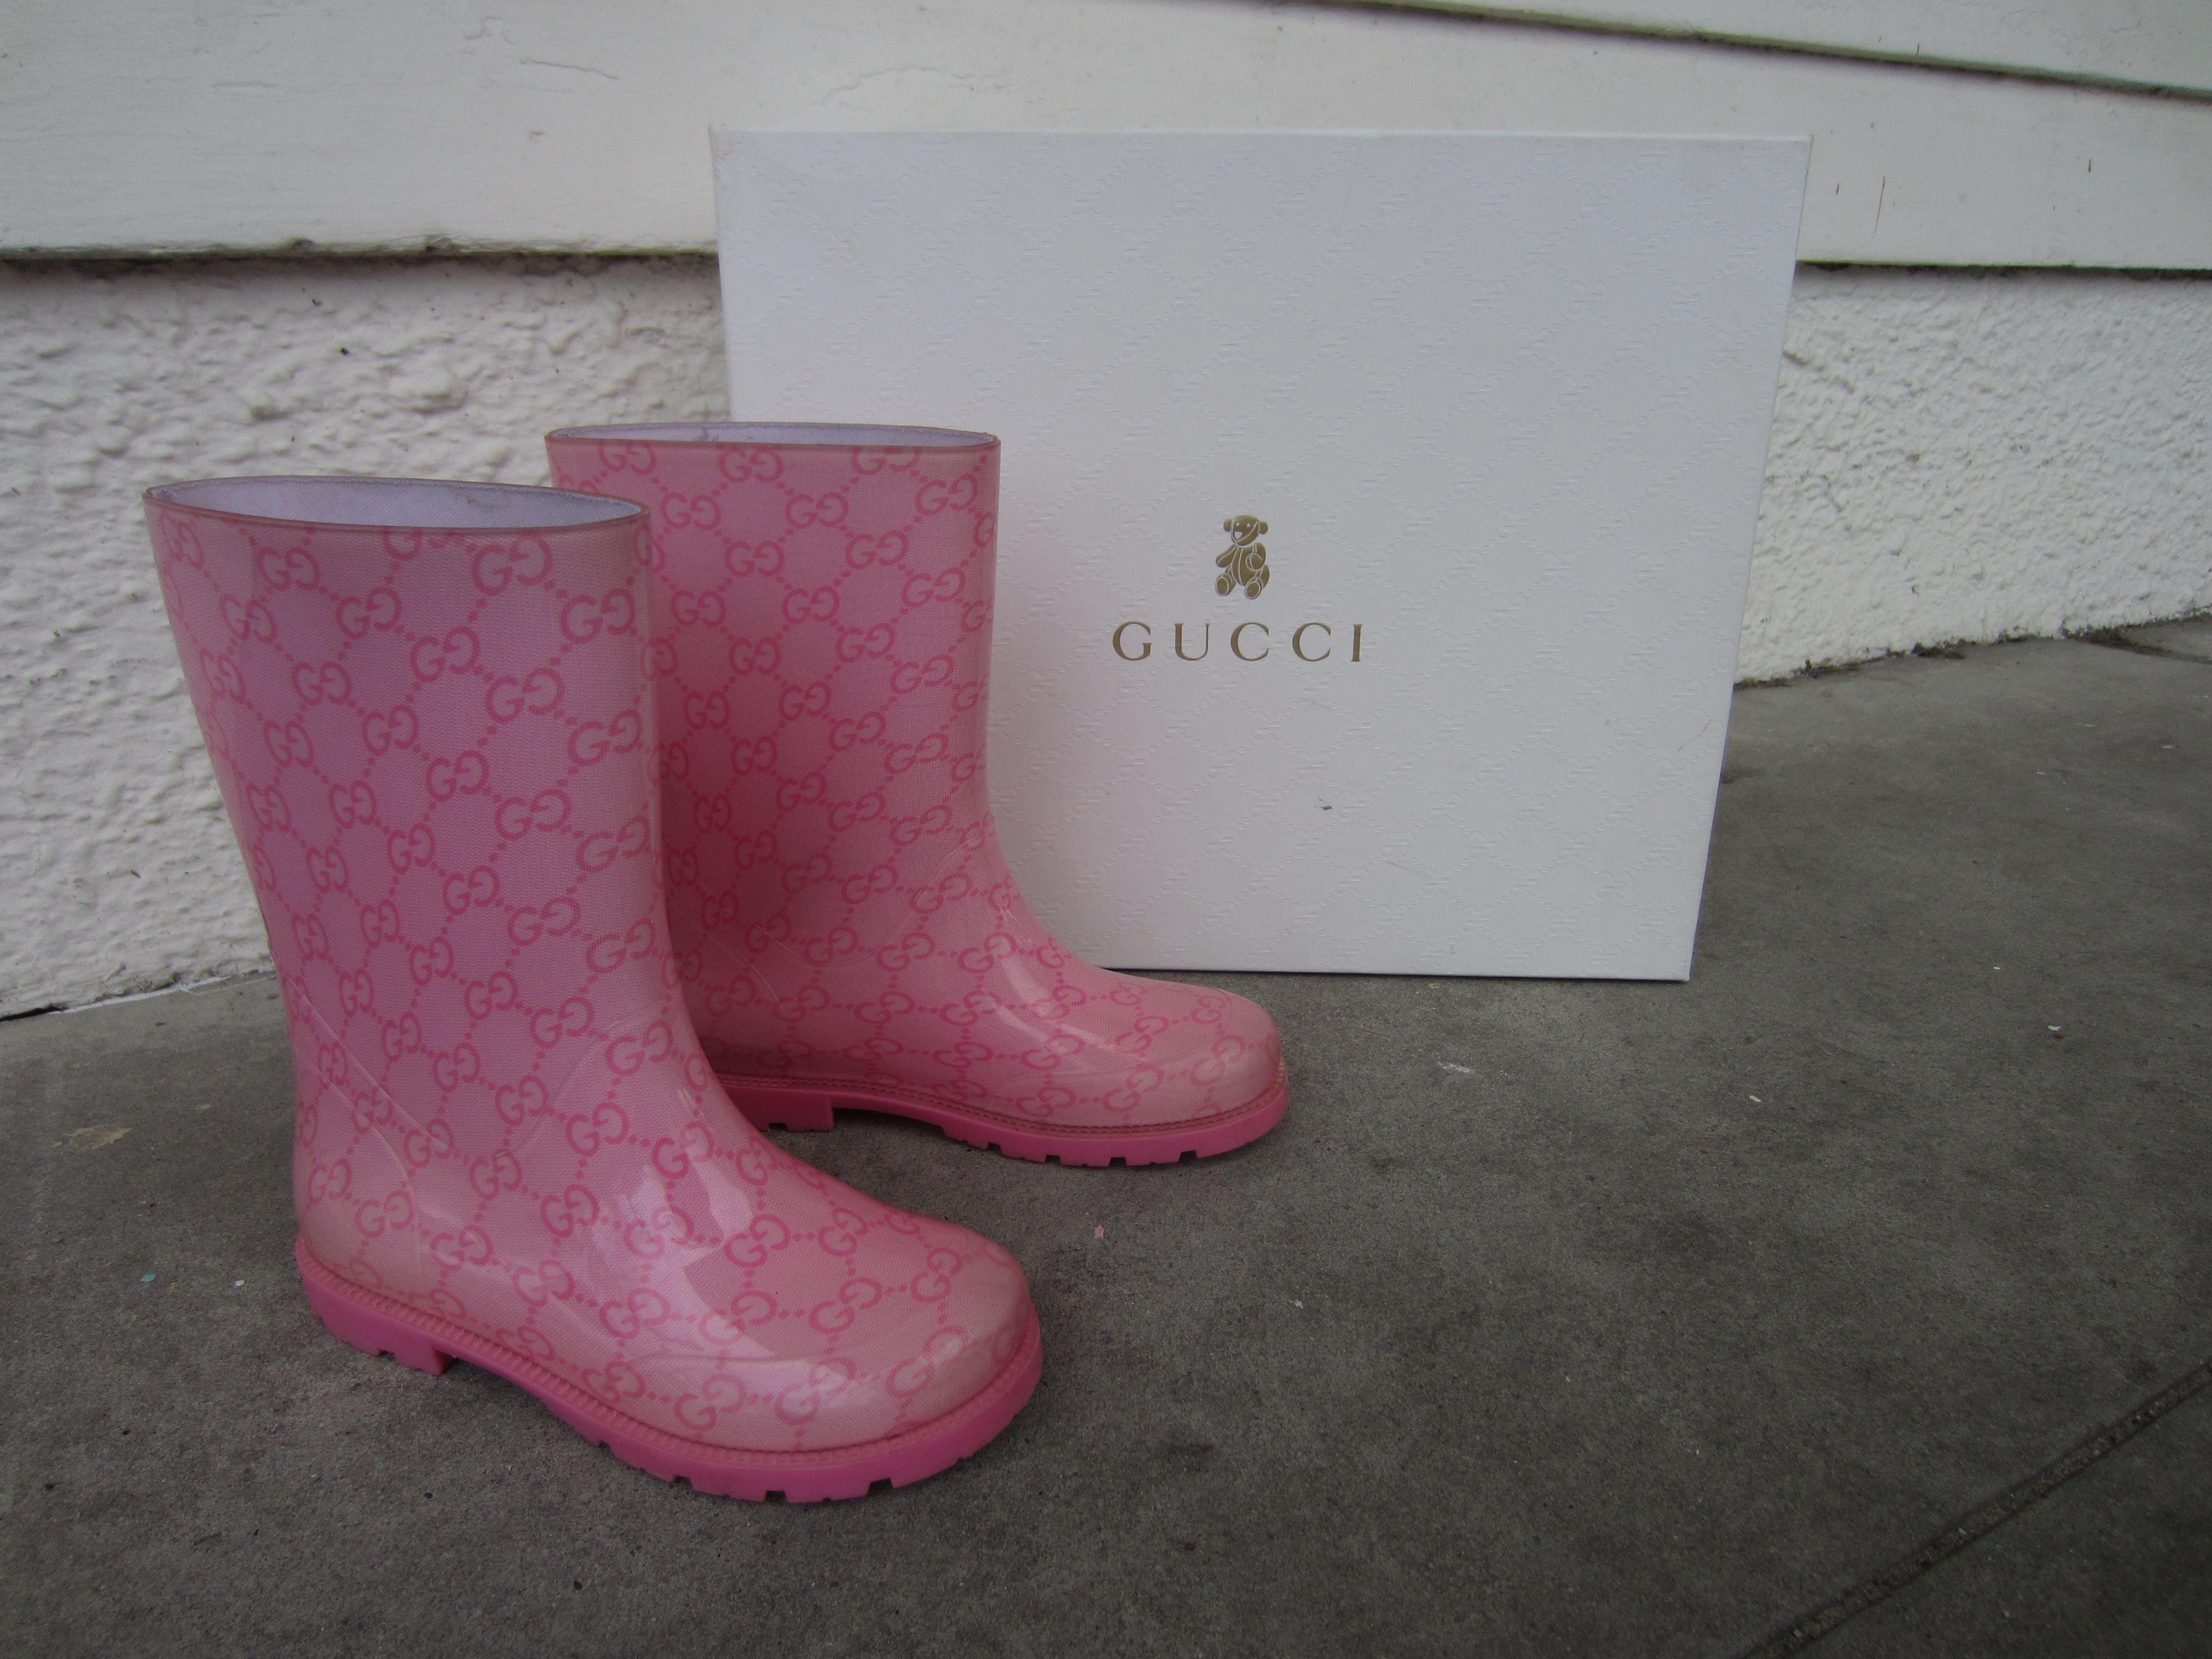 girls rain boots in store